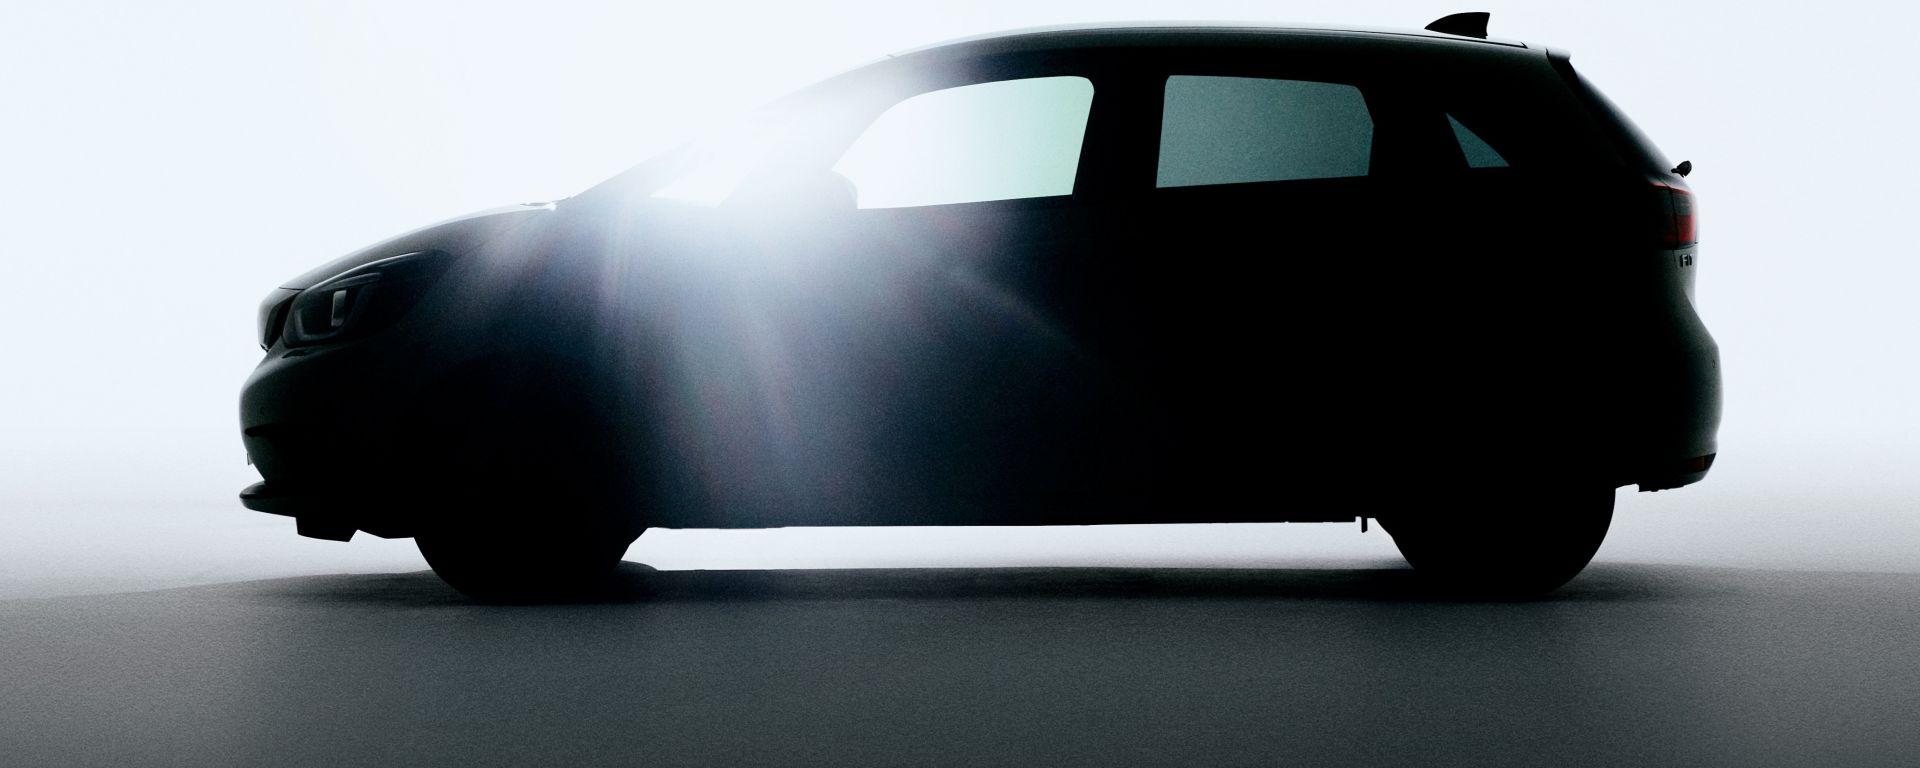 Nuova Honda Jazz 2020: l'immagine teaser